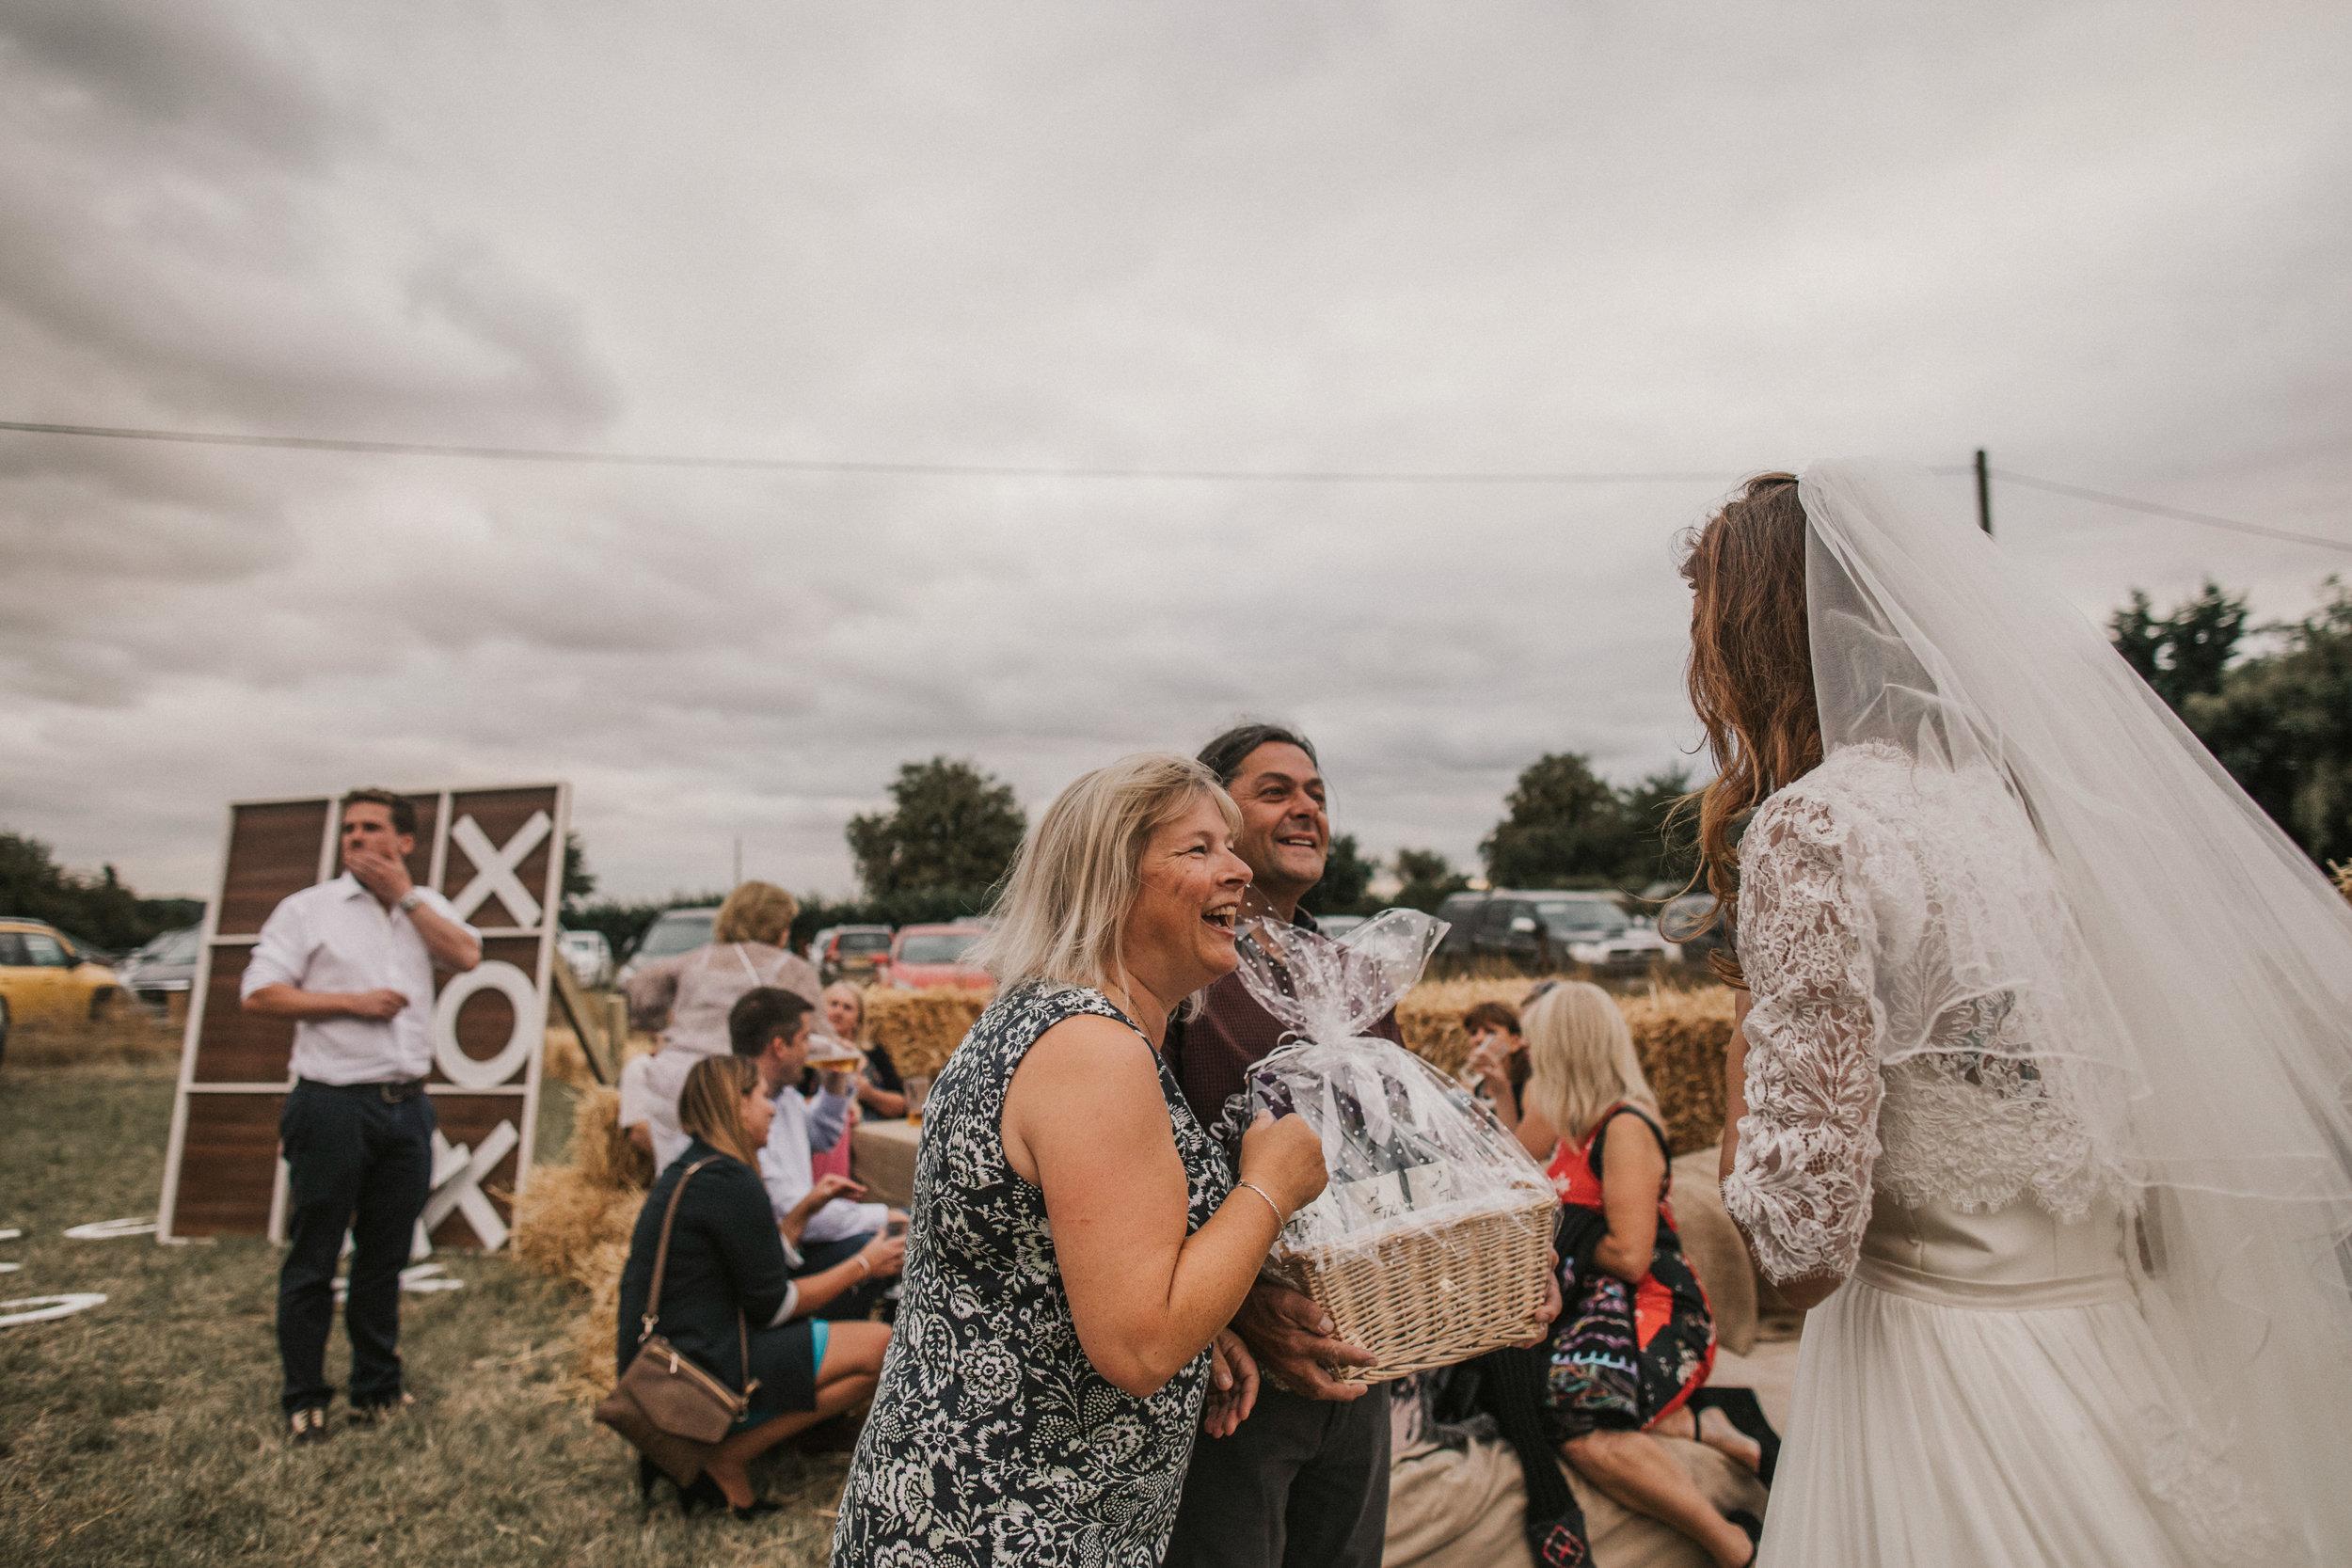 brook rose photography  Farm wedding_104.jpg